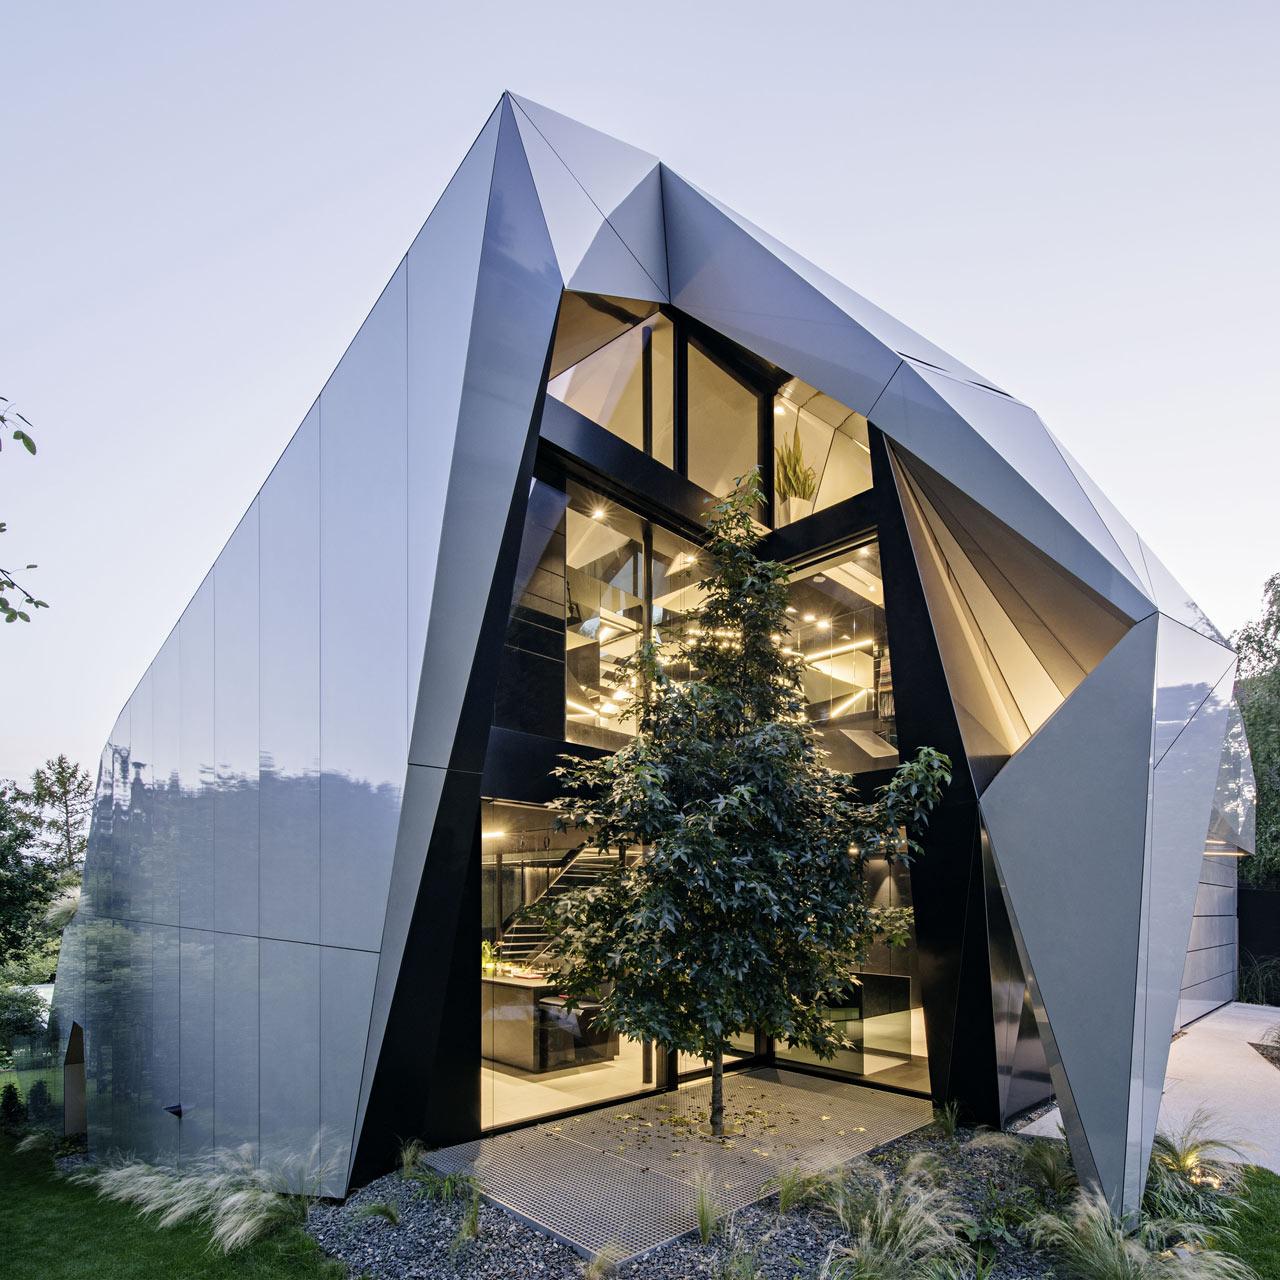 Modern Building Designs 2019: A' Design Award & Competition 2019